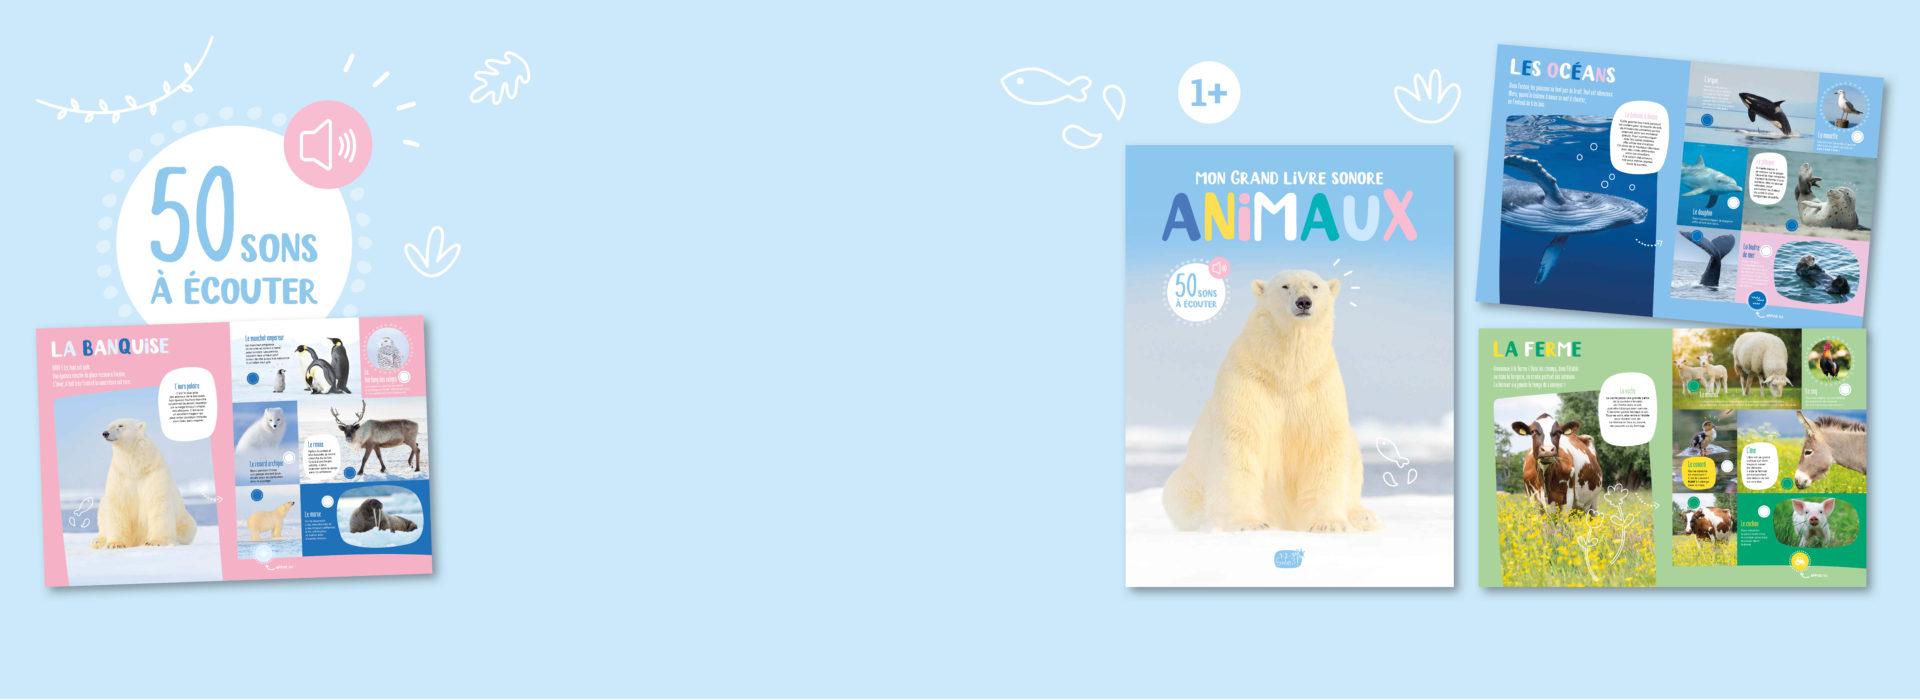 Mon grand livre sonore des animaux - slide